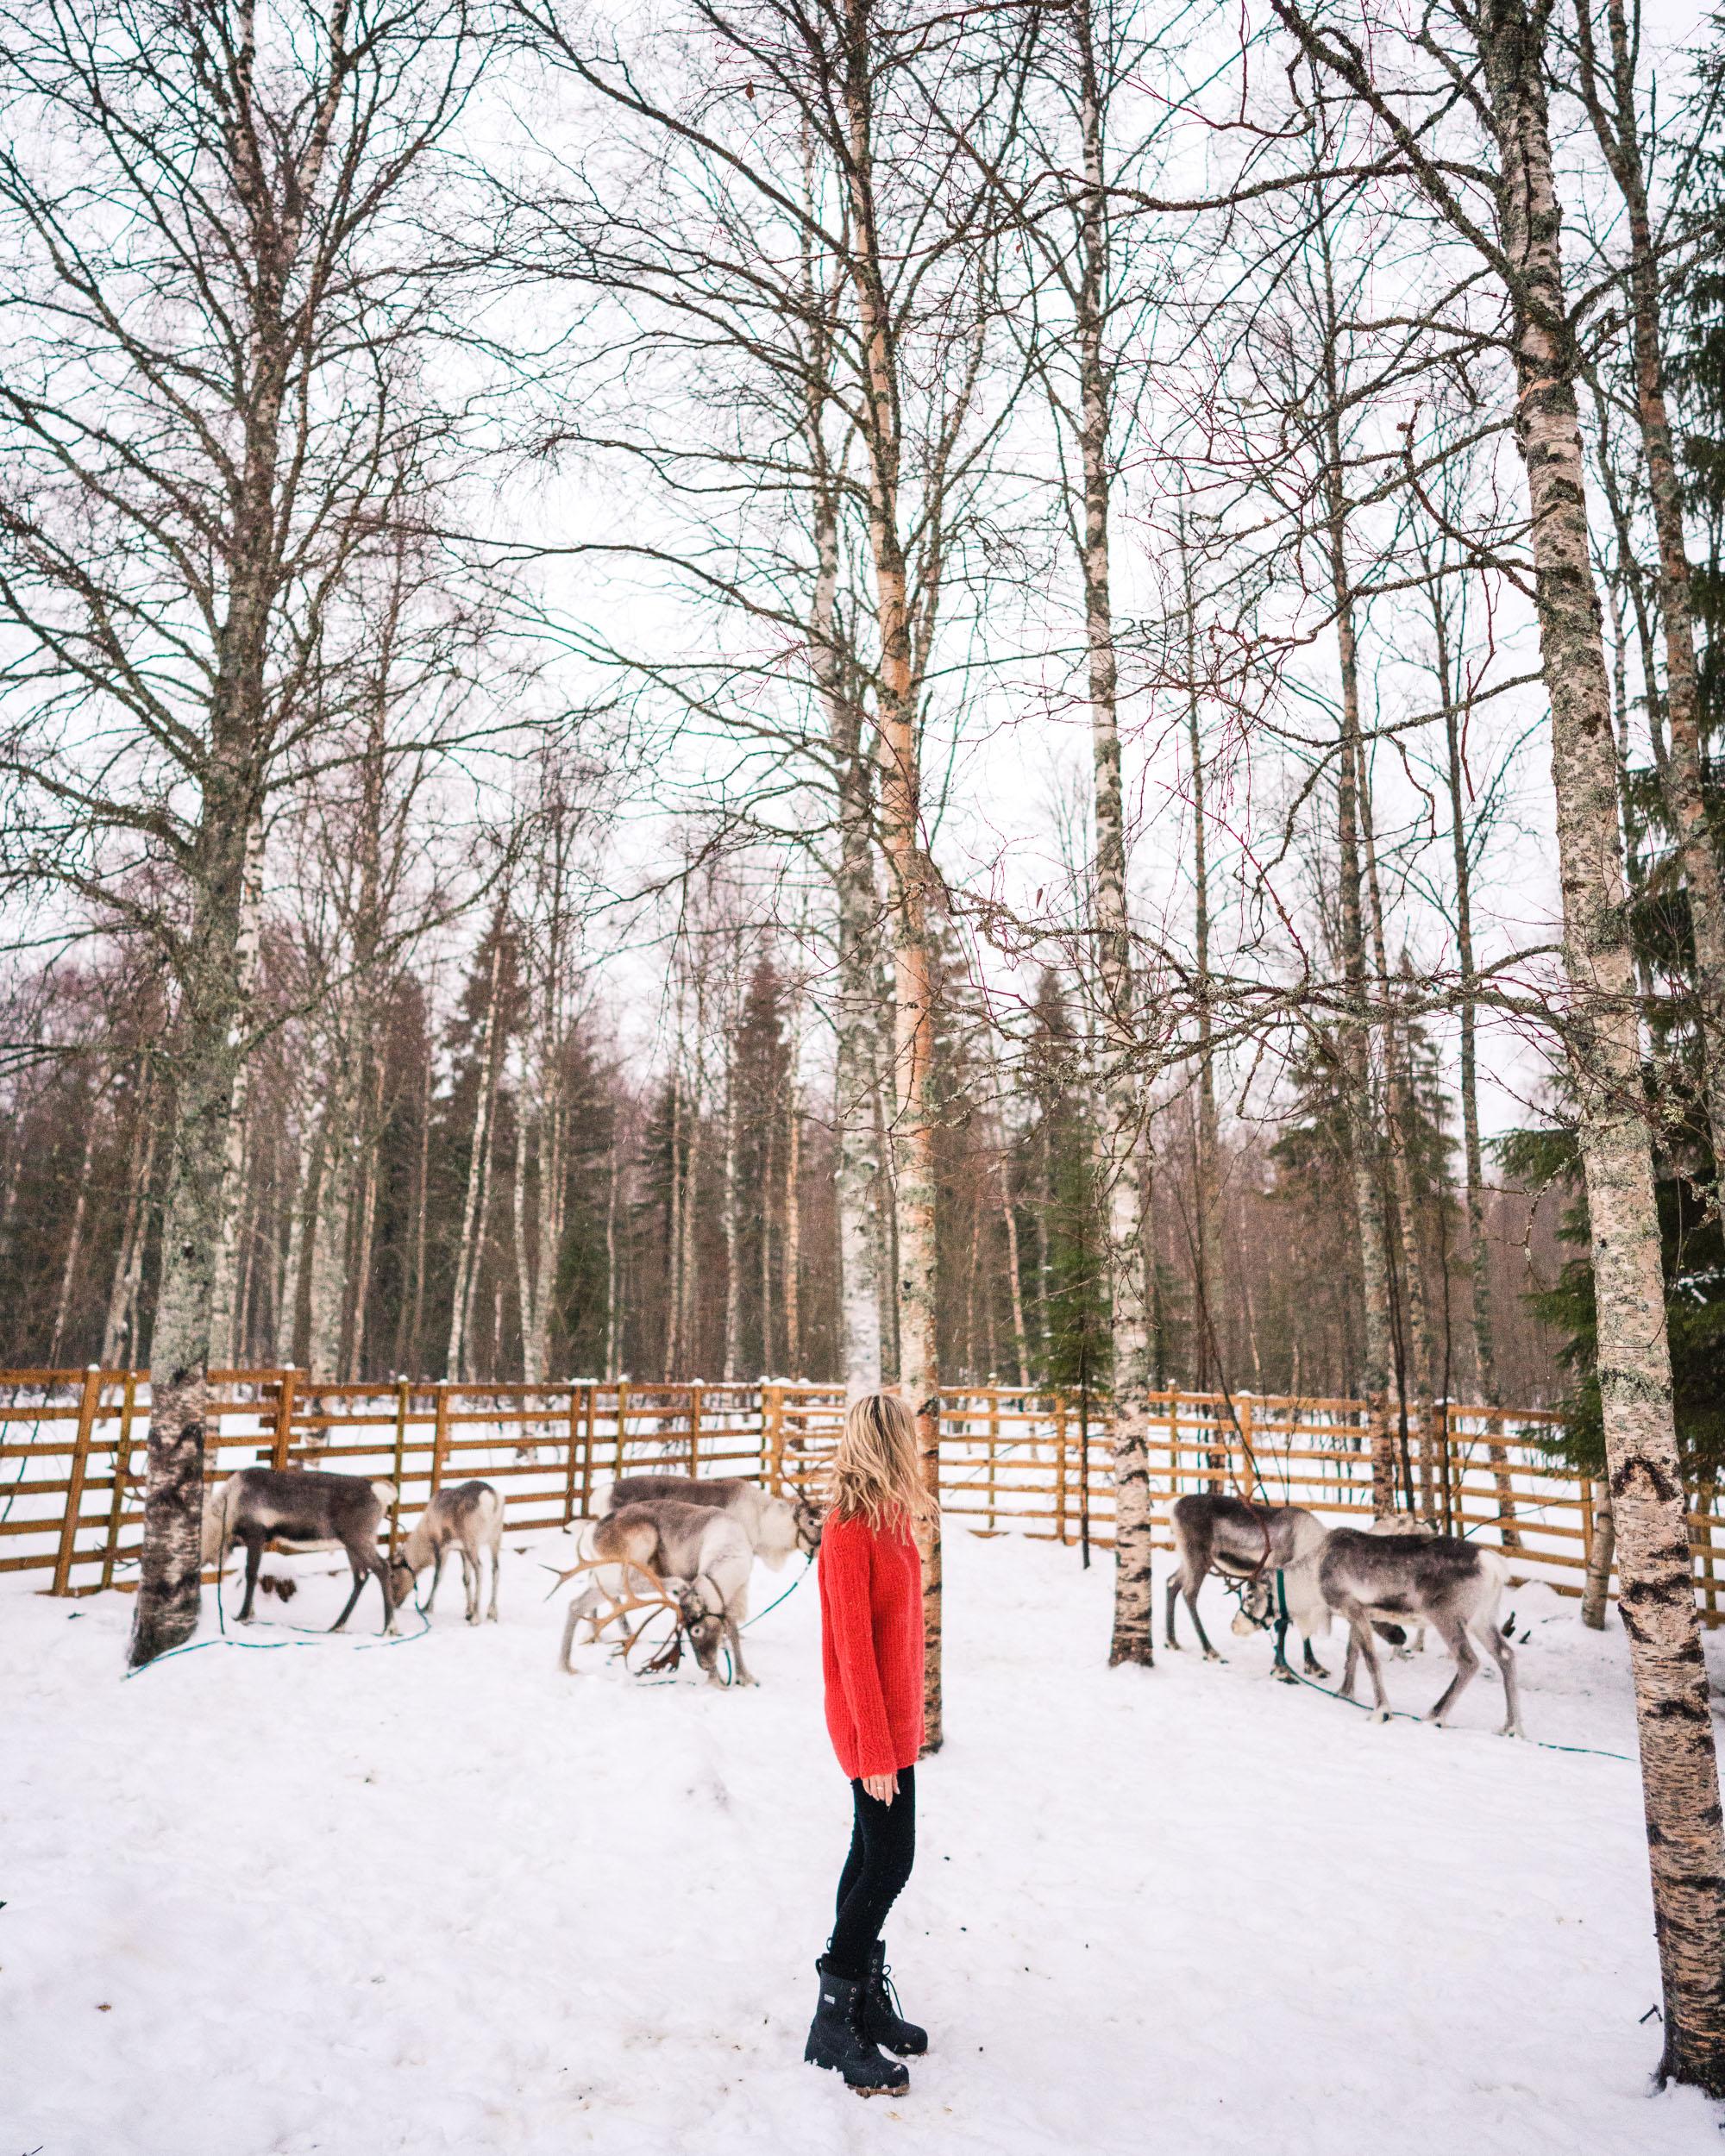 Feeding reindeer in kemi lapland finland